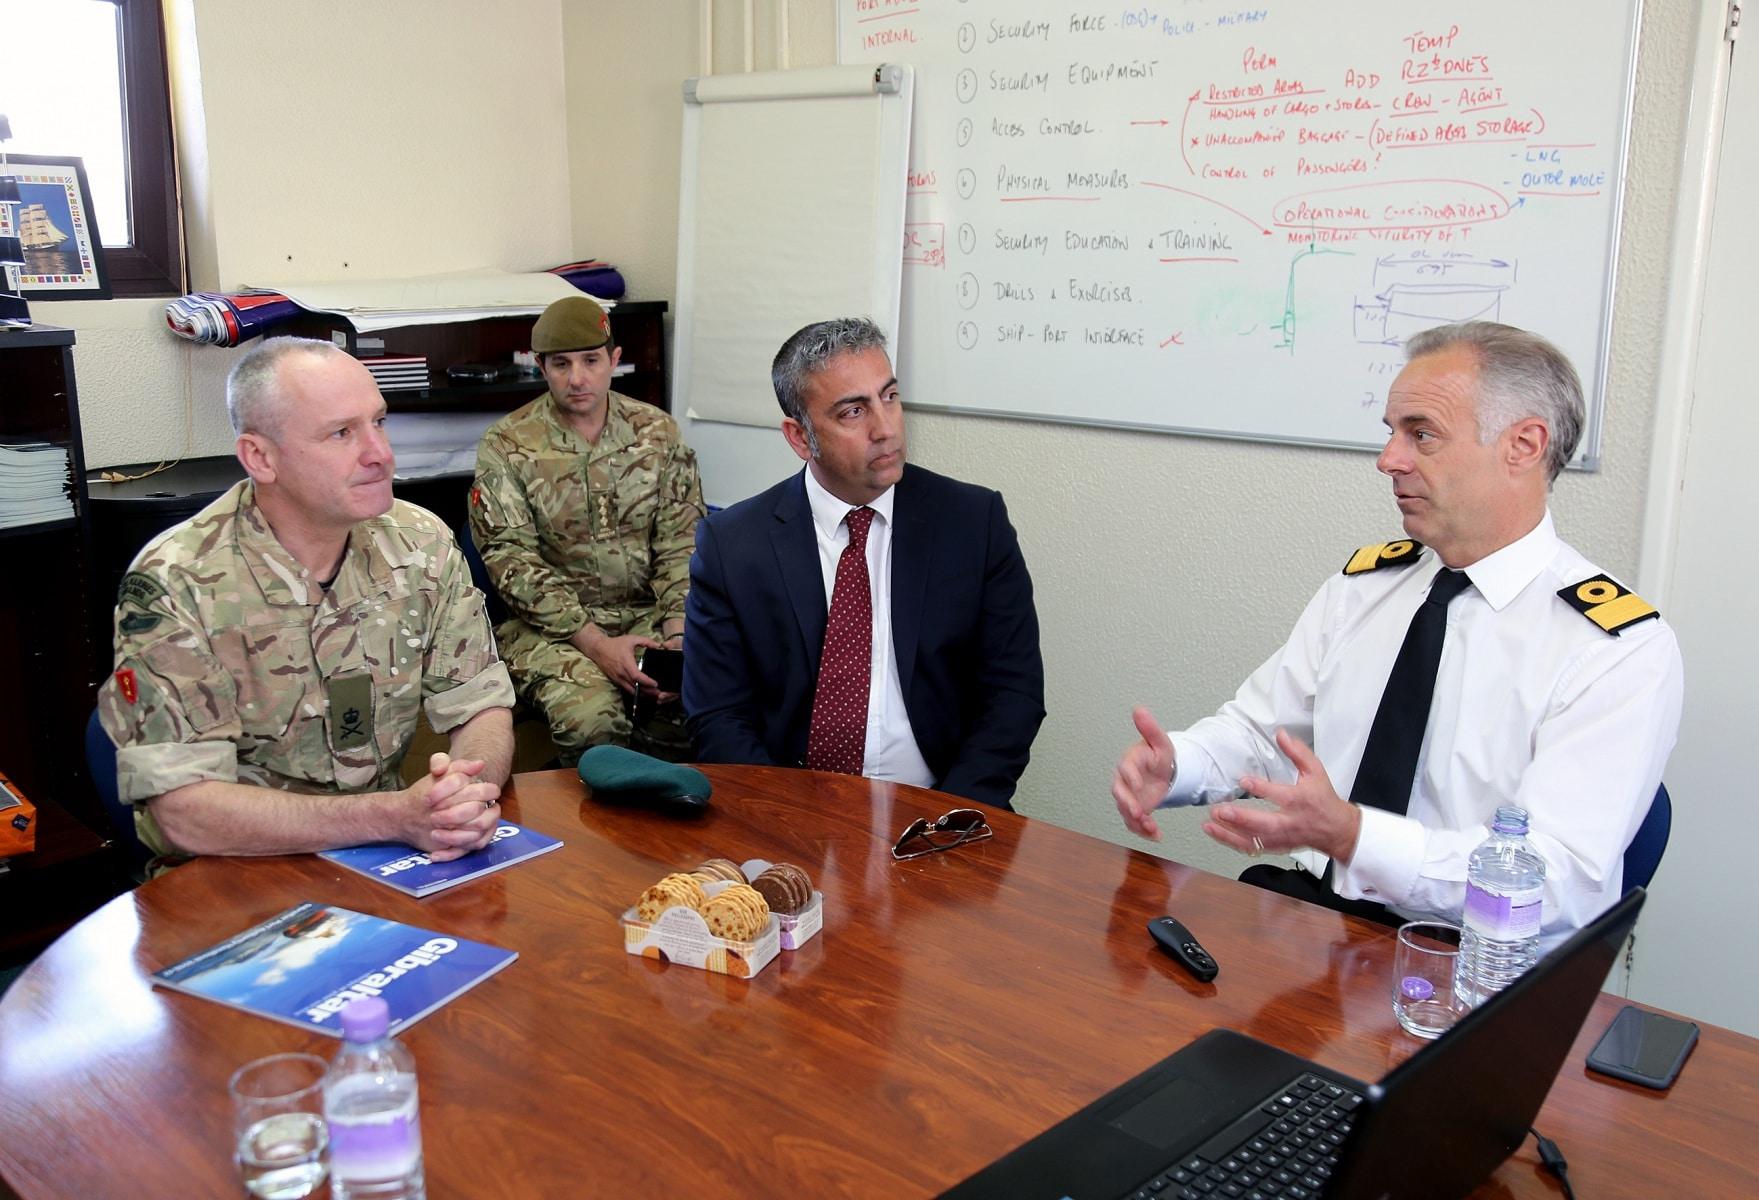 visita-oficial-del-gobernador-al-puerto-de-gibraltar_25549739864_o